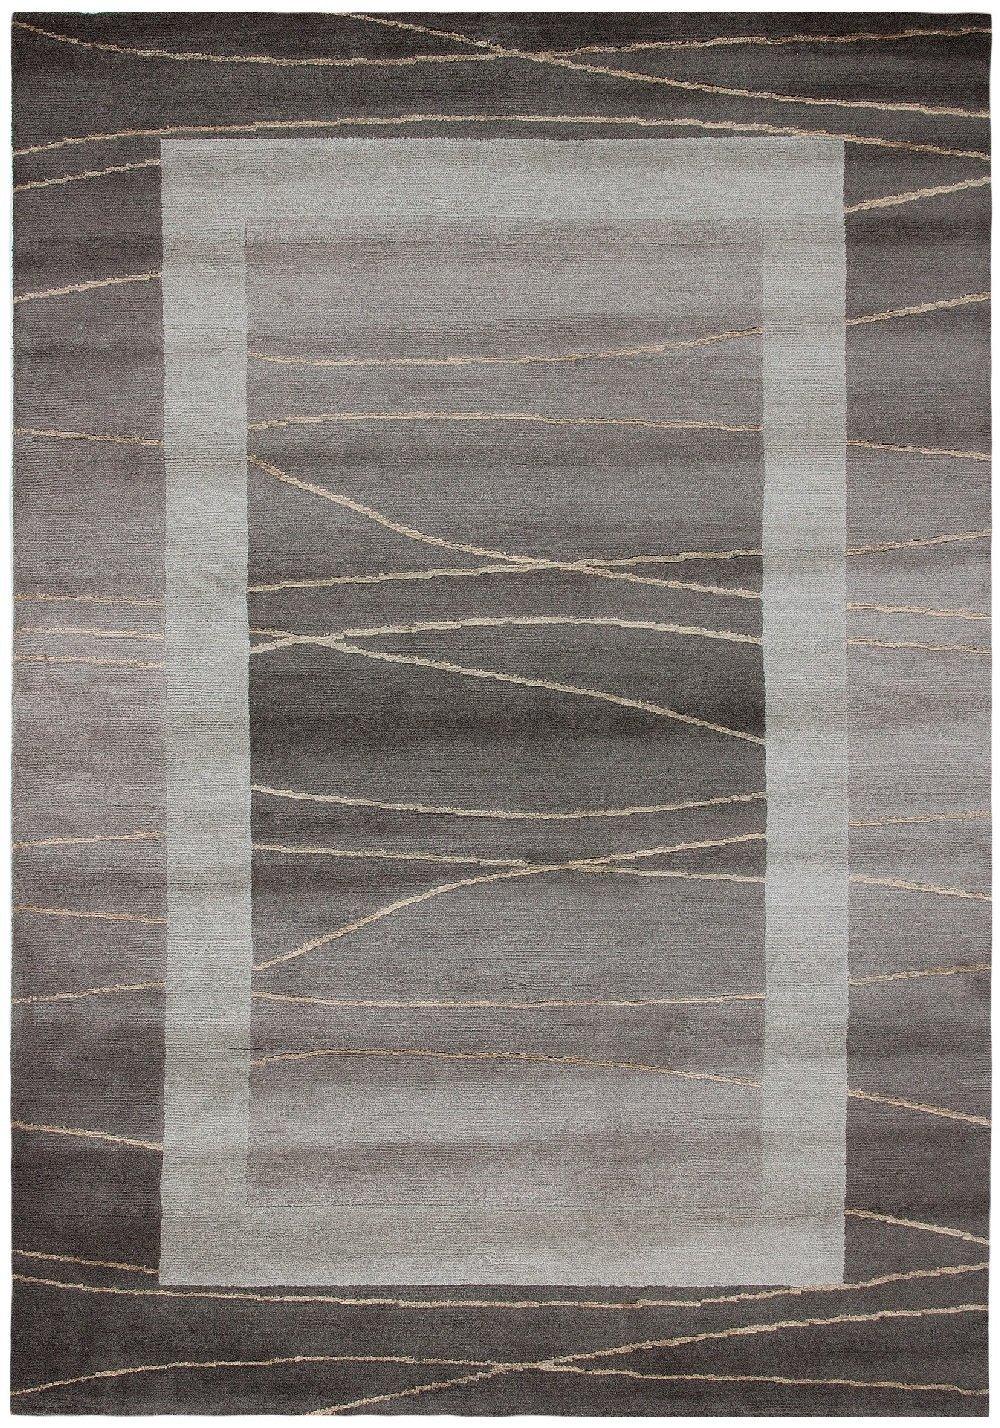 Sona-Lux Nepal Teppich handgeknüpft hellbraun